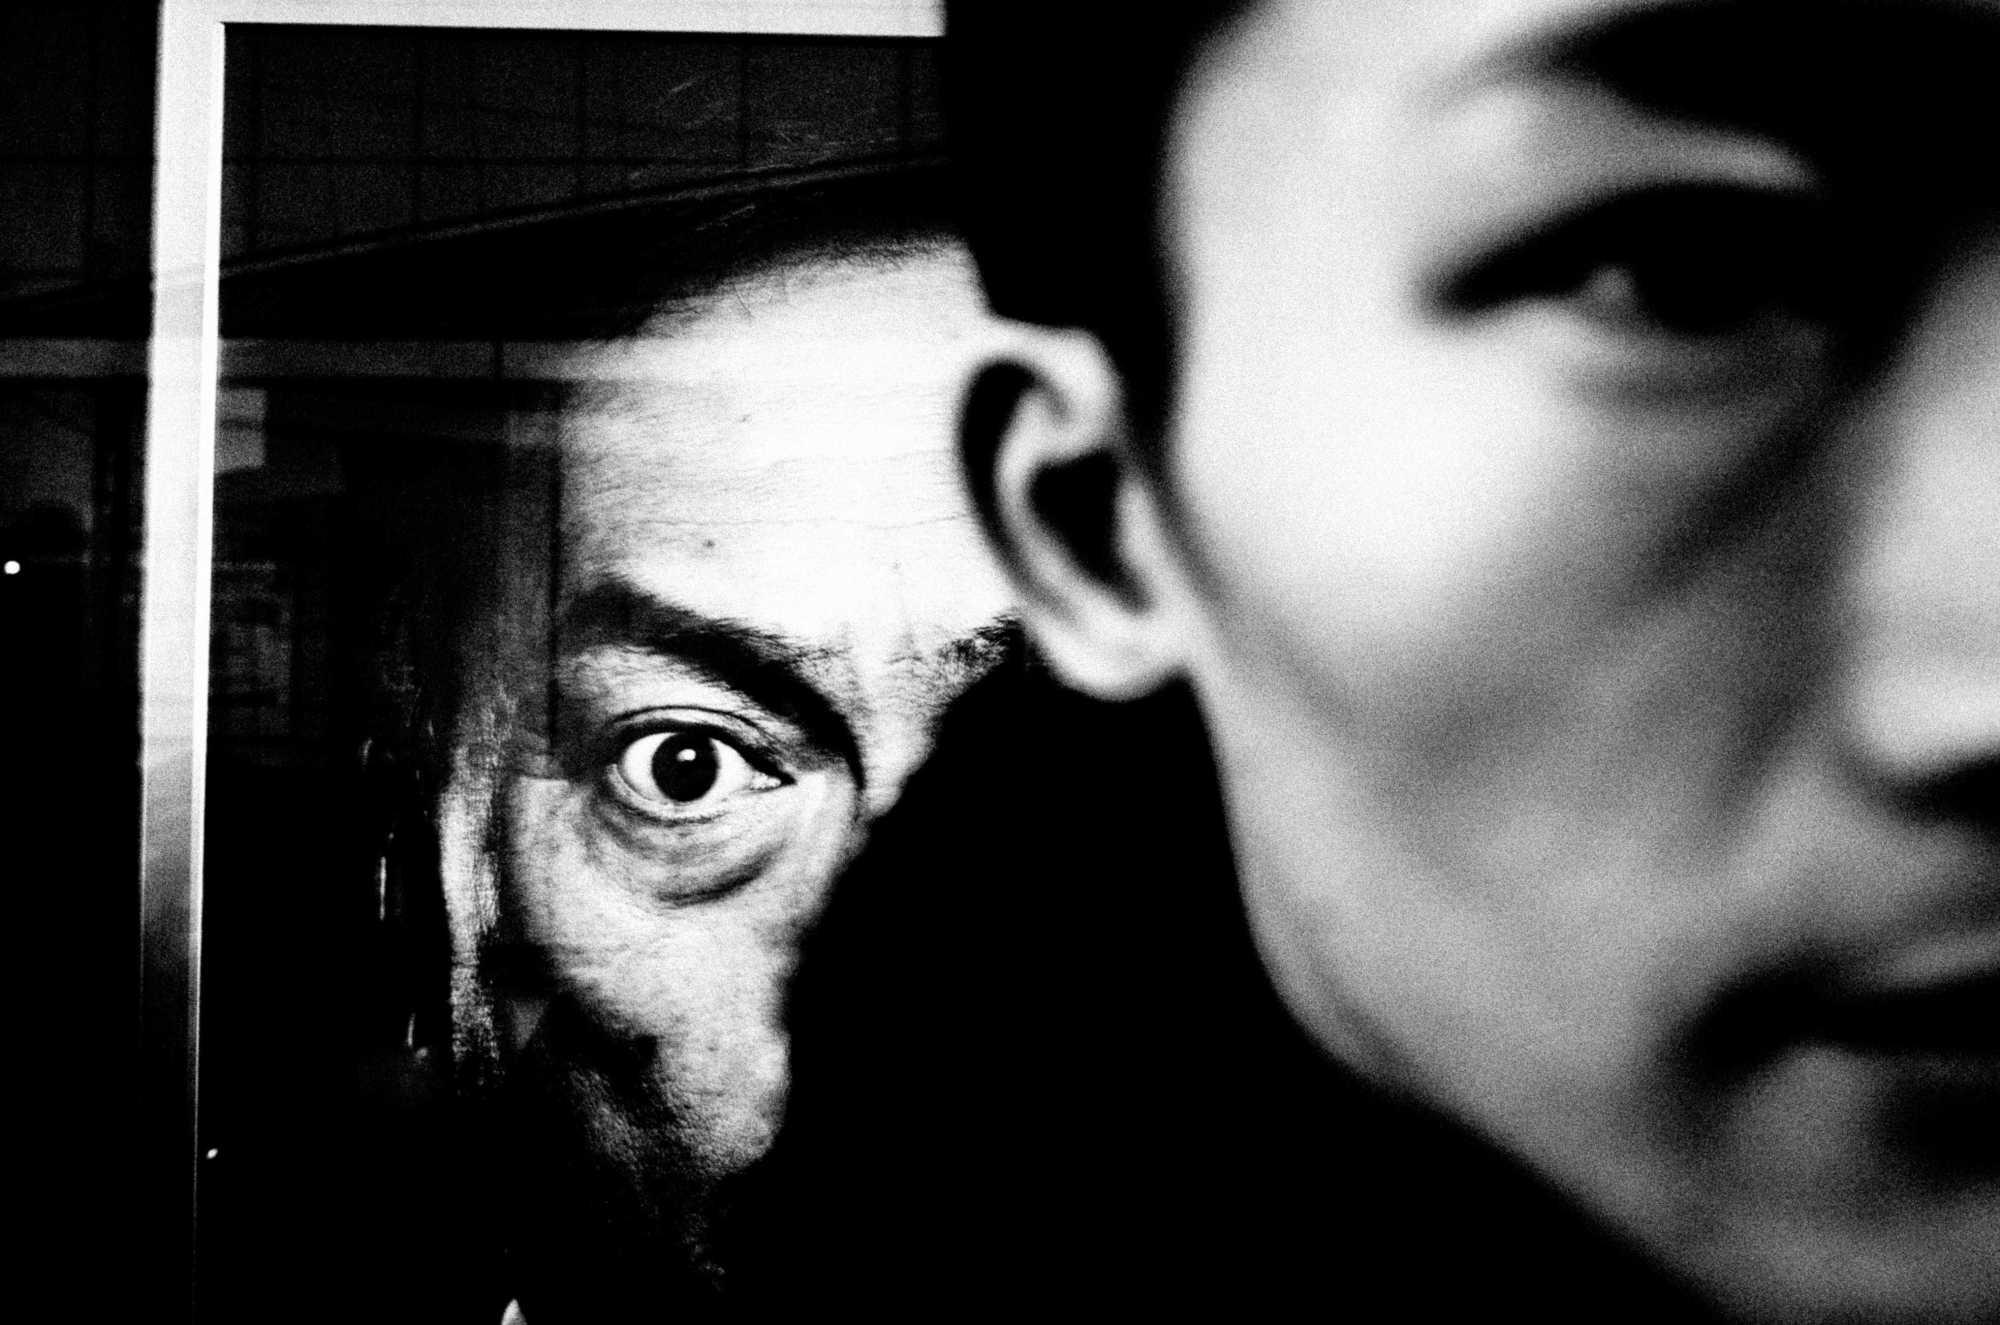 tokyo-eye-eric-kim-street-photography-contact-sheet-0000547